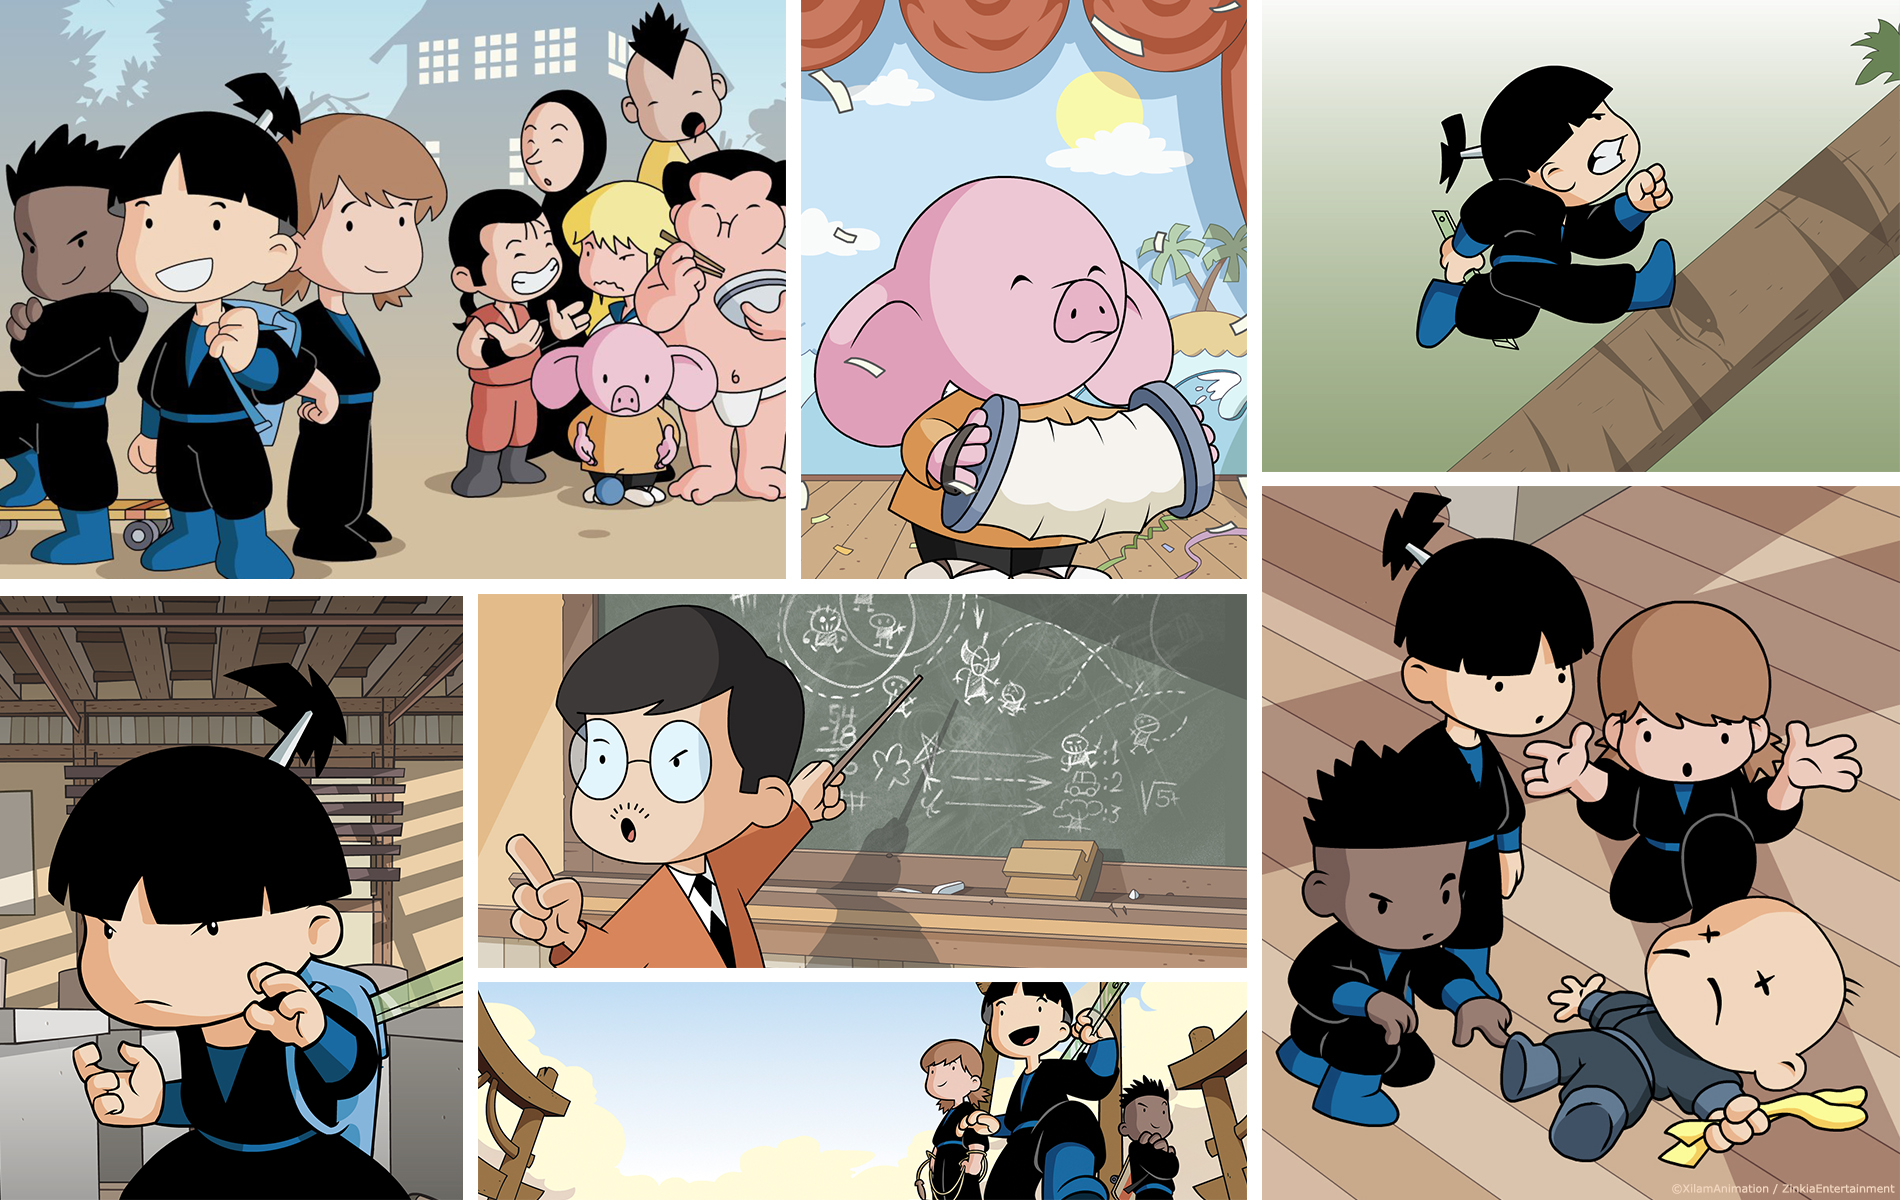 Shuriken School - Dessin animée 2D - Diffuseur Gulli - Studio animation 2 minutes